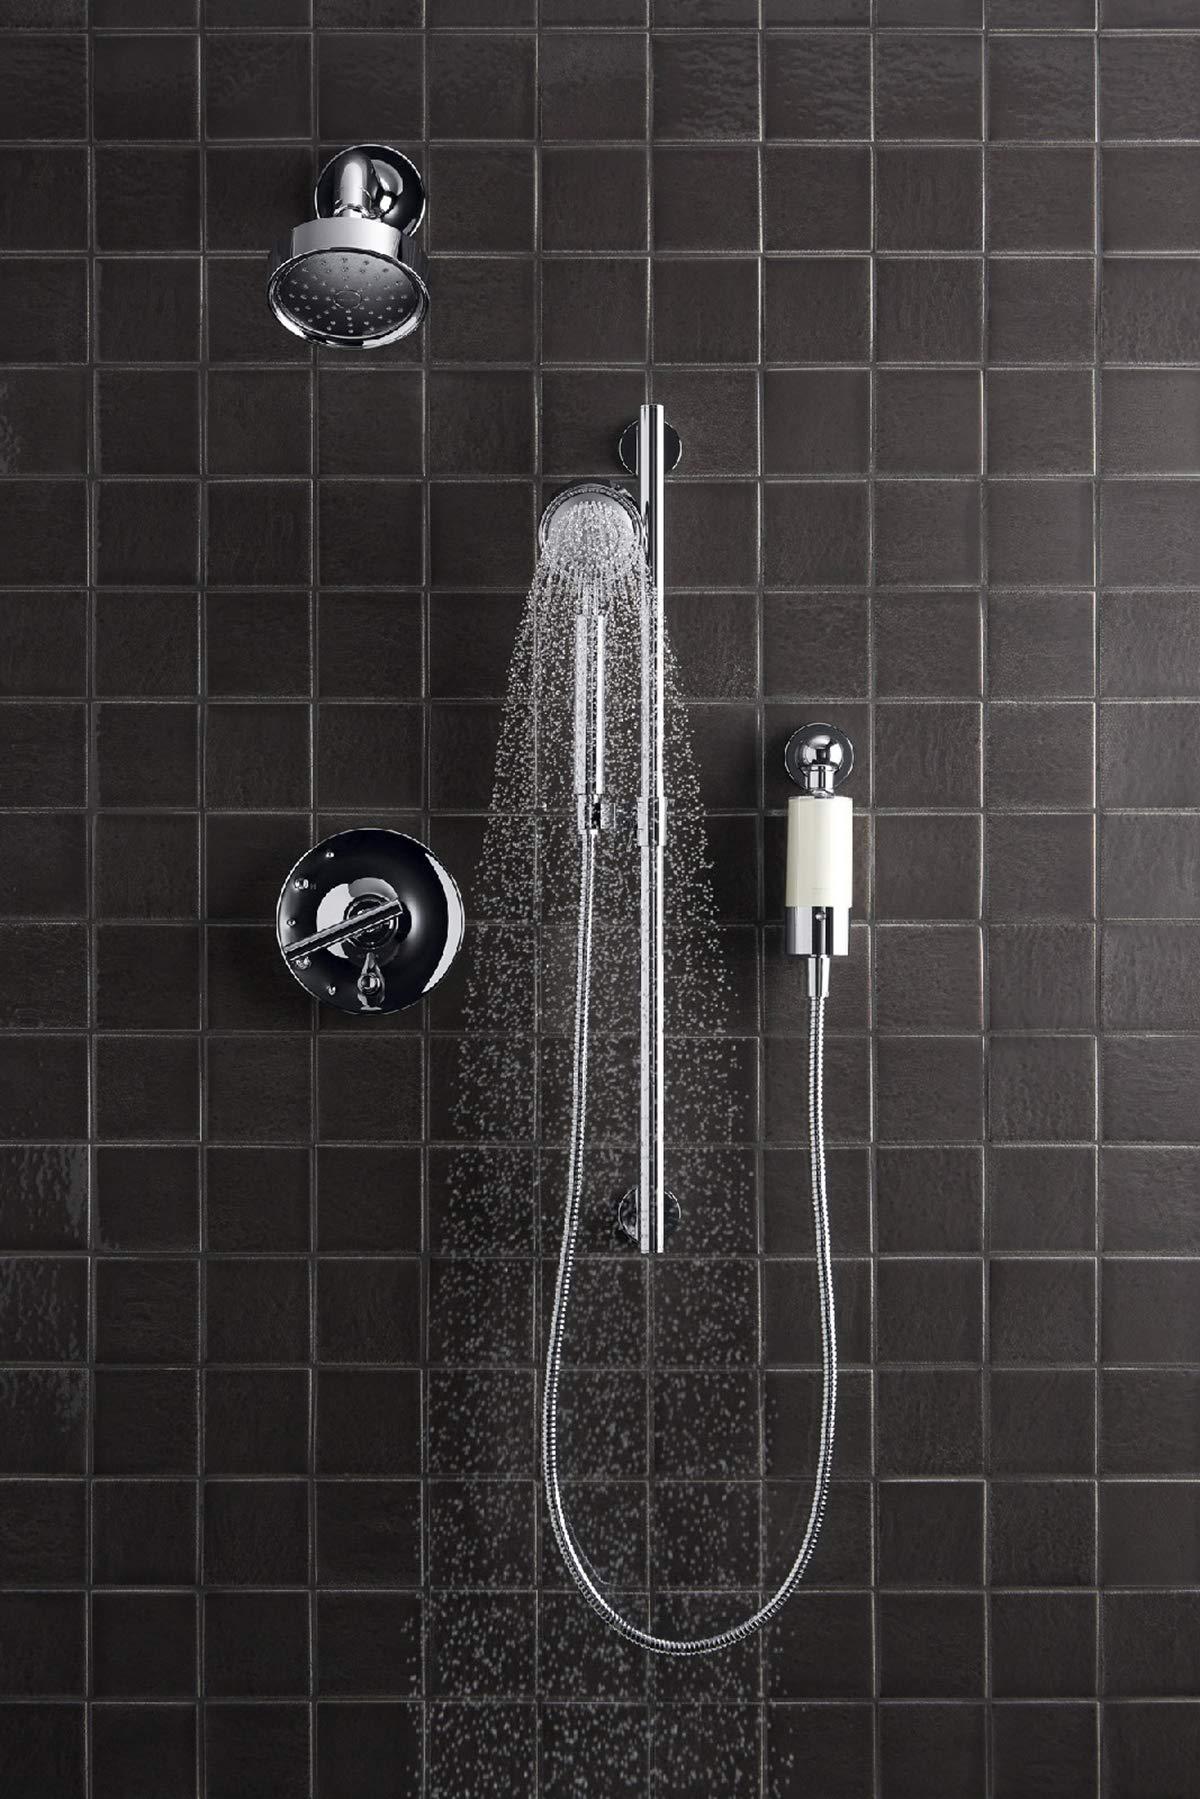 Kohler 30646-CP Aquifer Shower Water Filtration System, Reduce Chlorine and Odor, Includes Filter Replacement by Kohler (Image #8)